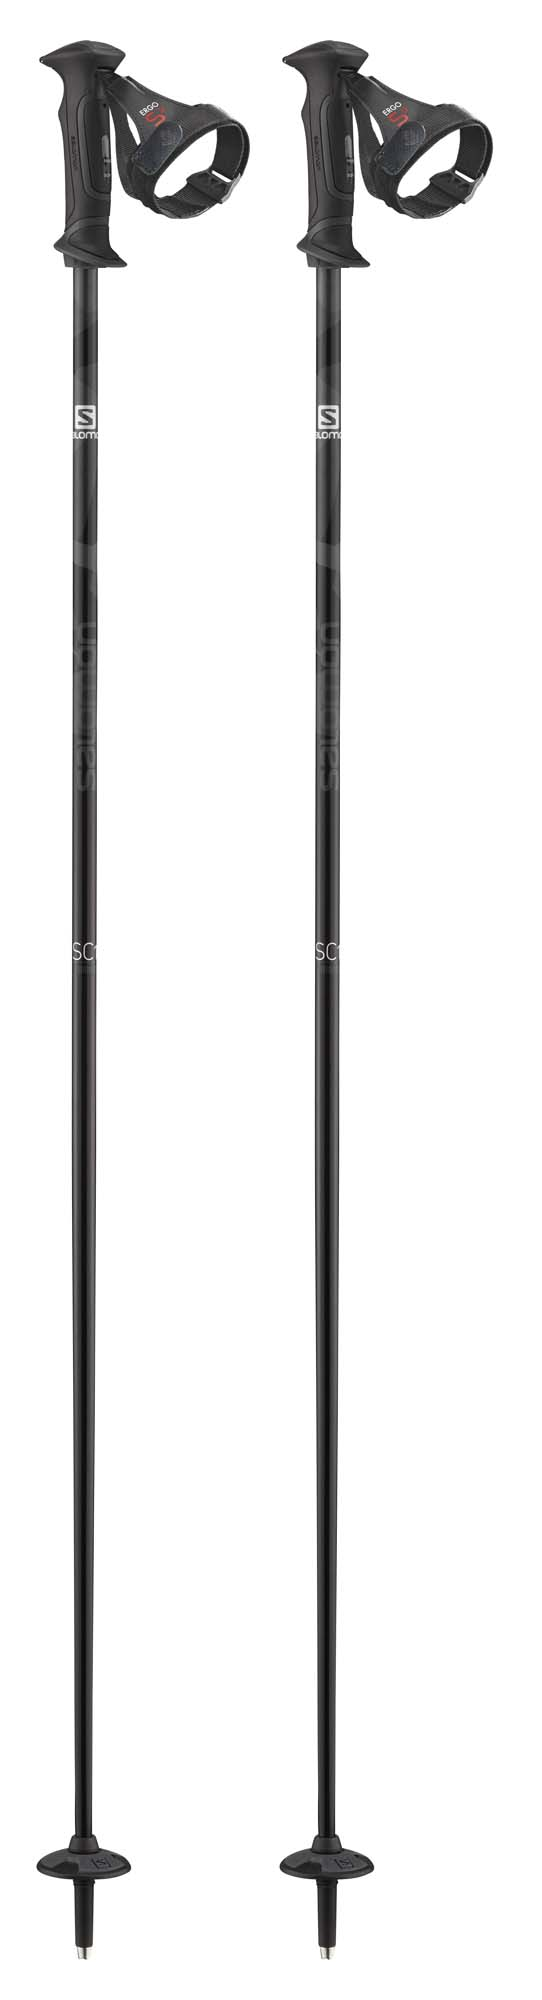 Salomon 2021 SC1 Ergo S3 Ski Poles NEW !!  120,130,135cm